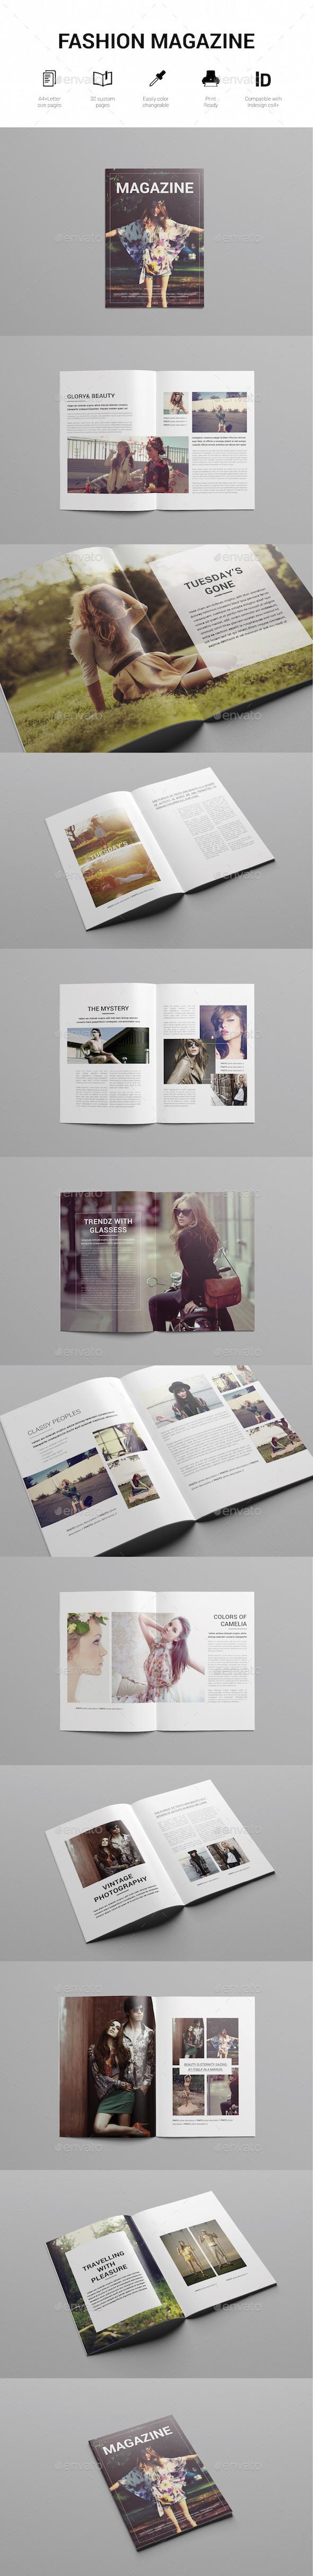 Minimal Fashion Magazine Template - Magazines Print Templates